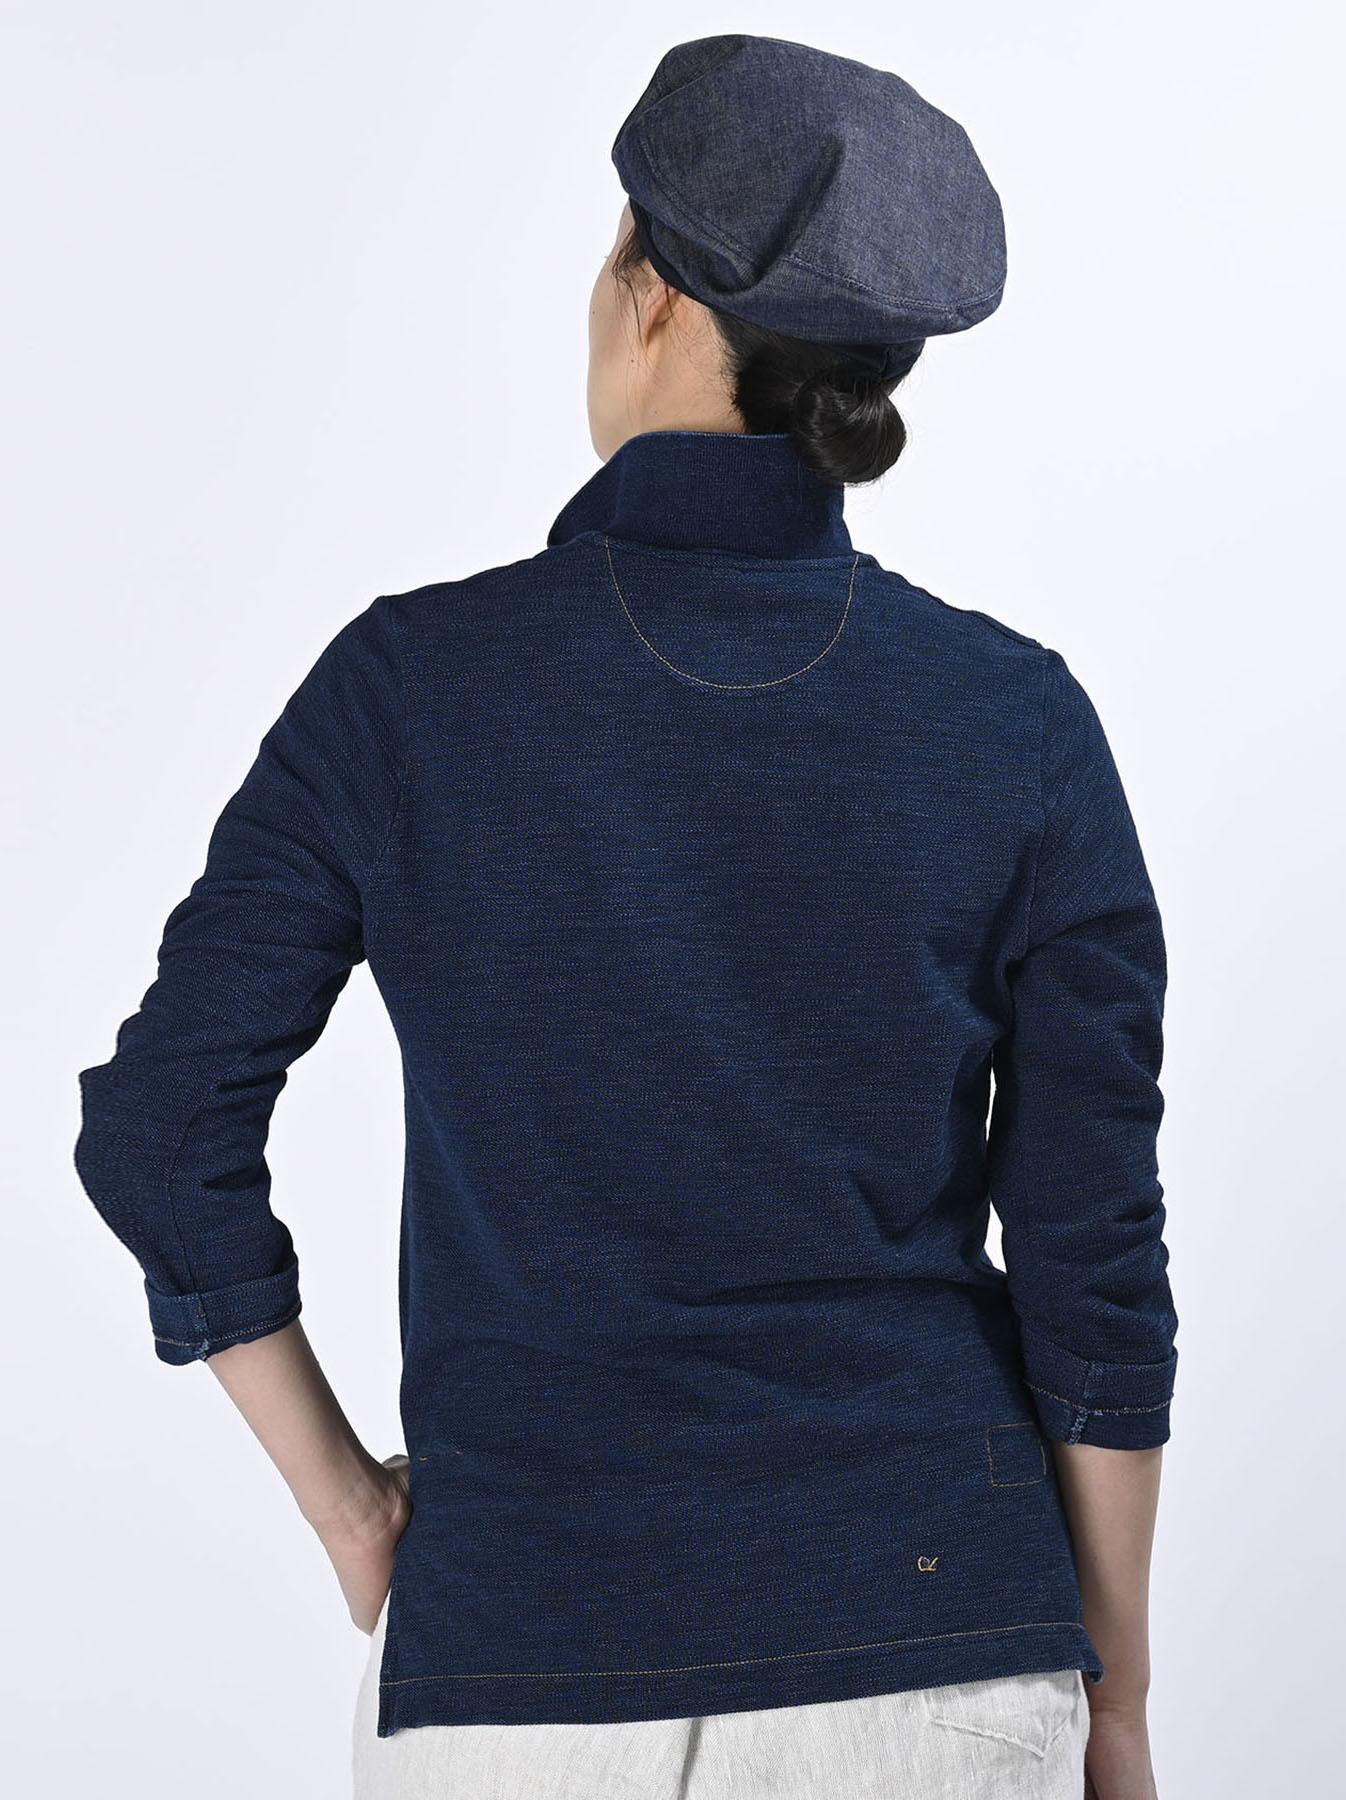 Indigo Kanoko Shiokaze Long-sleeved Square Polo Shirt (0521)-6